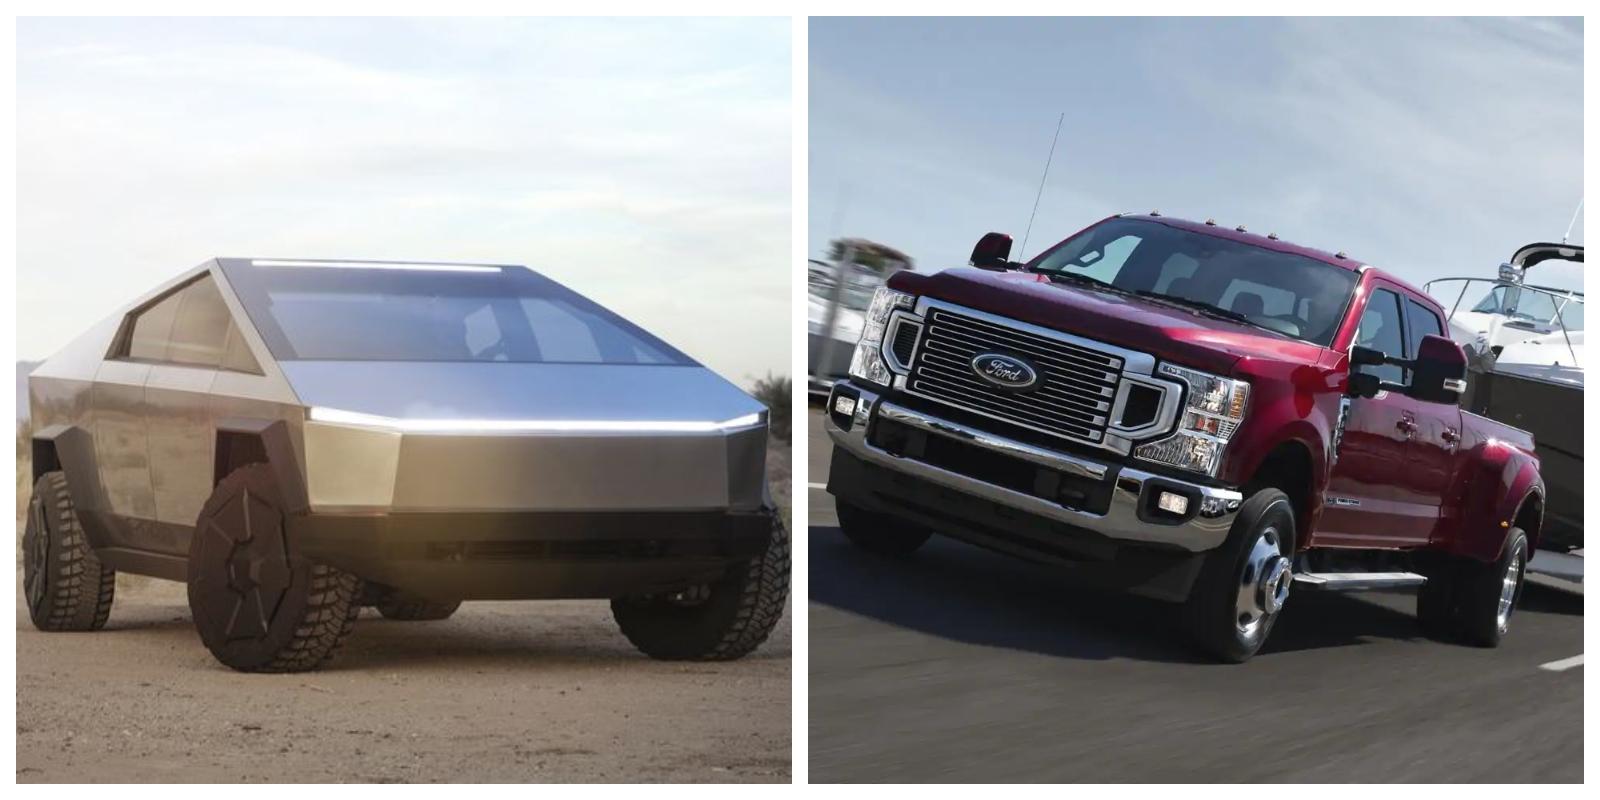 Tesla Cybertruck vs Ford F-250, F-350, F-450 comparison